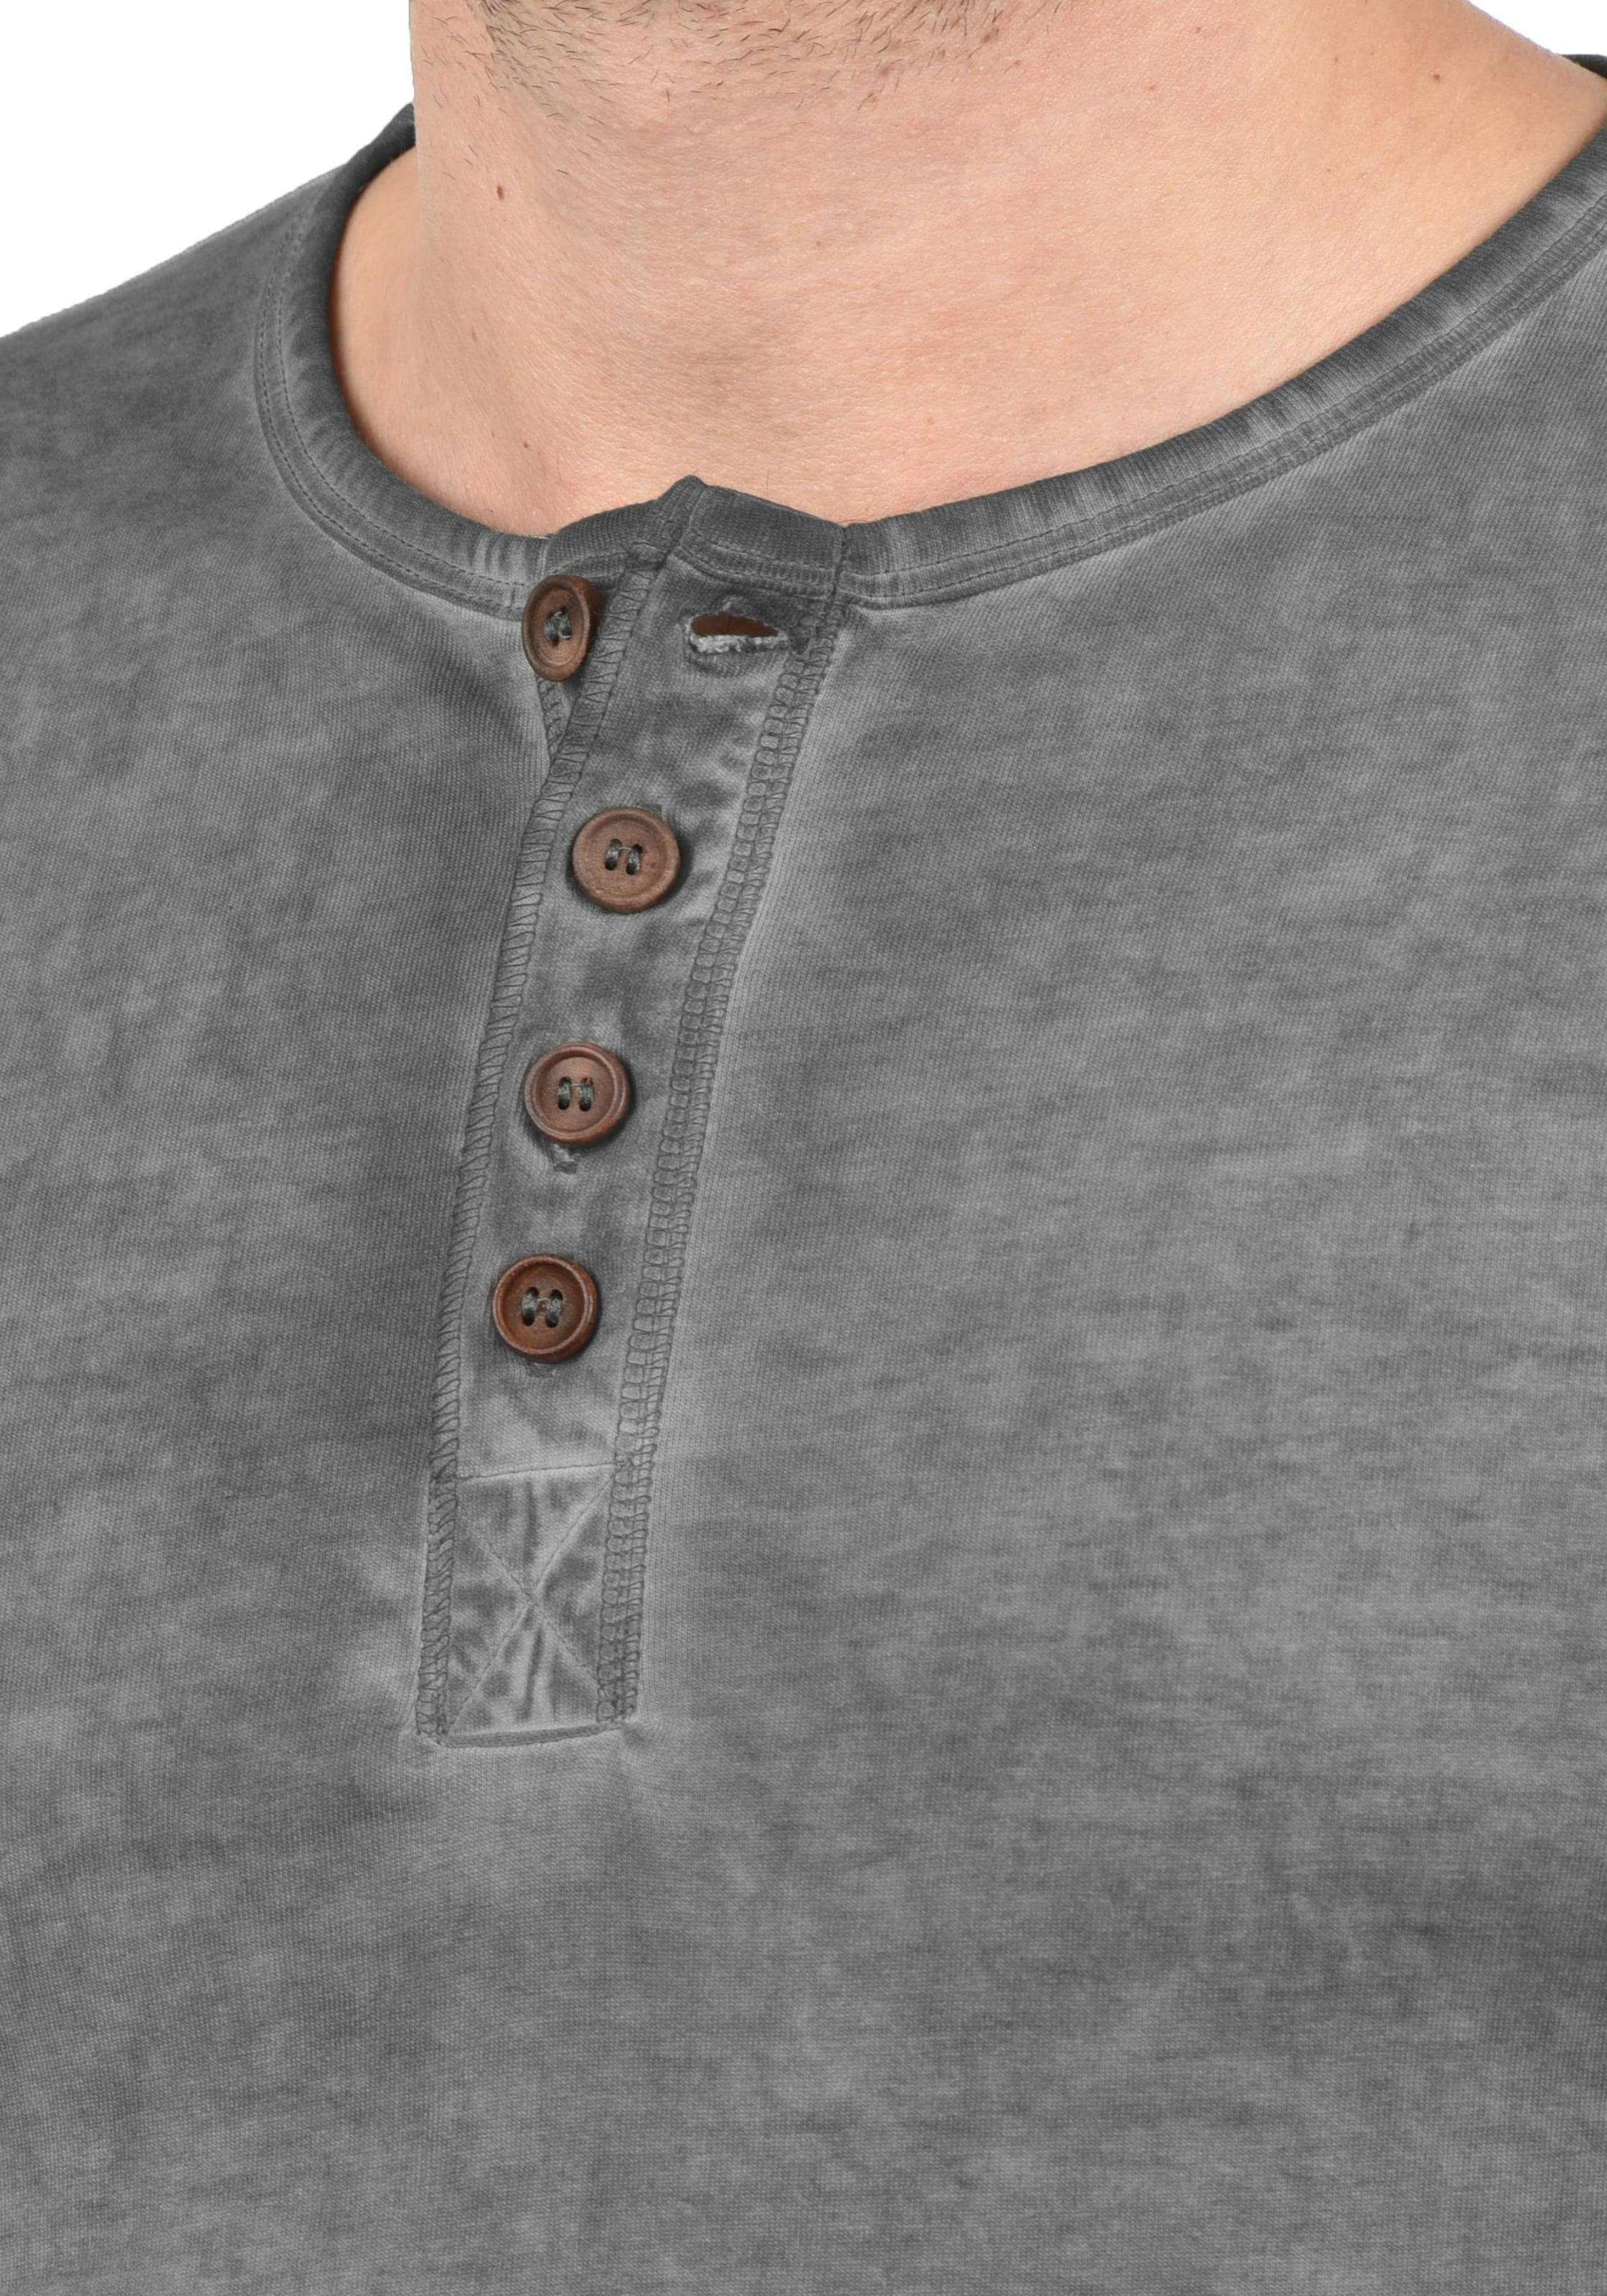 'tihn' 'tihn' solid solid Grau solid Rundhalsshirt Grau Rundhalsshirt In 'tihn' Rundhalsshirt In 9DYeW2IEHb